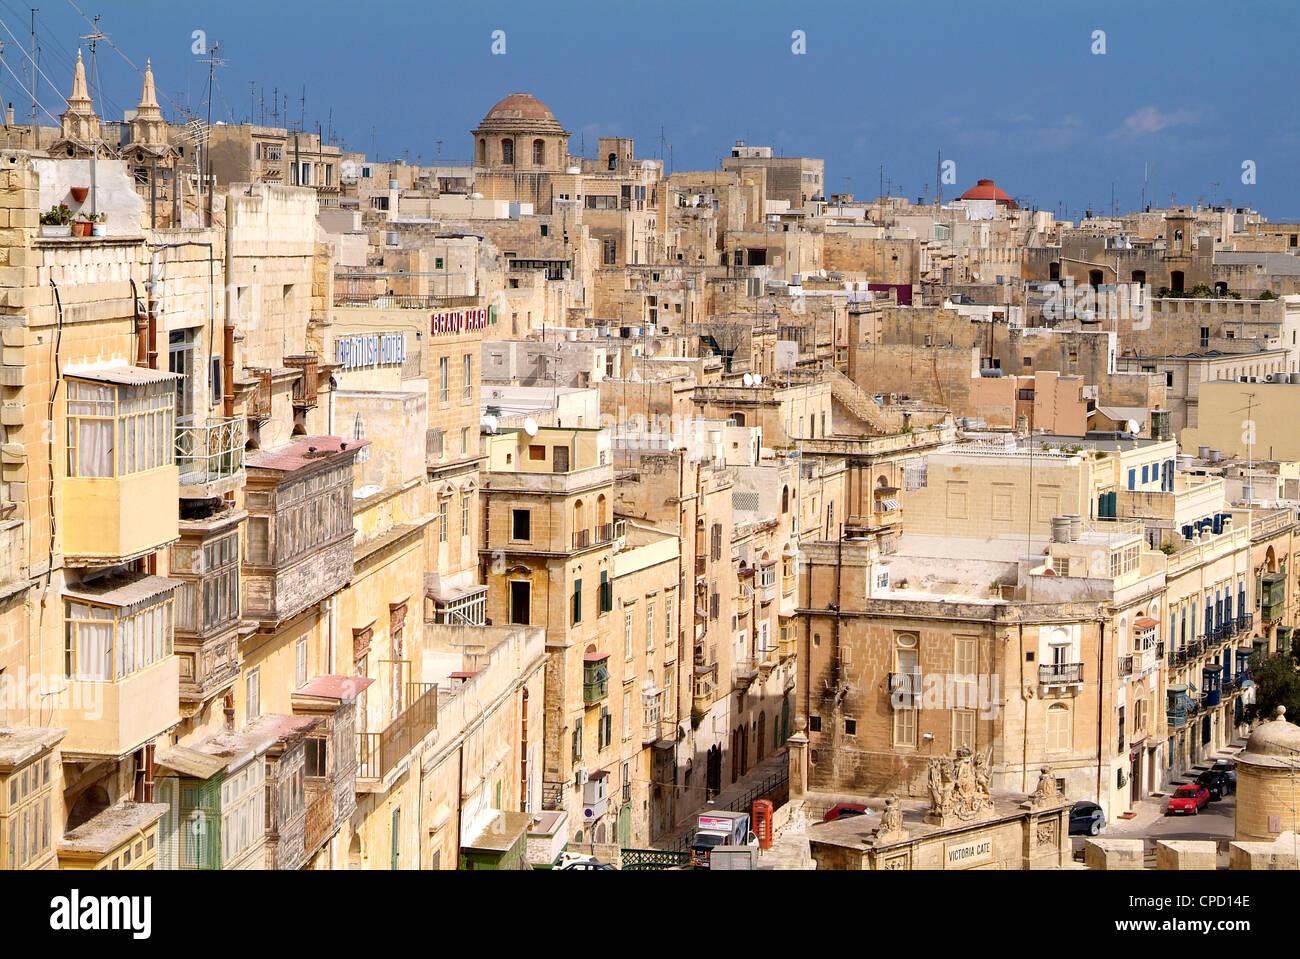 Valletta, Malta, Mediterranean, Europe - Stock Image